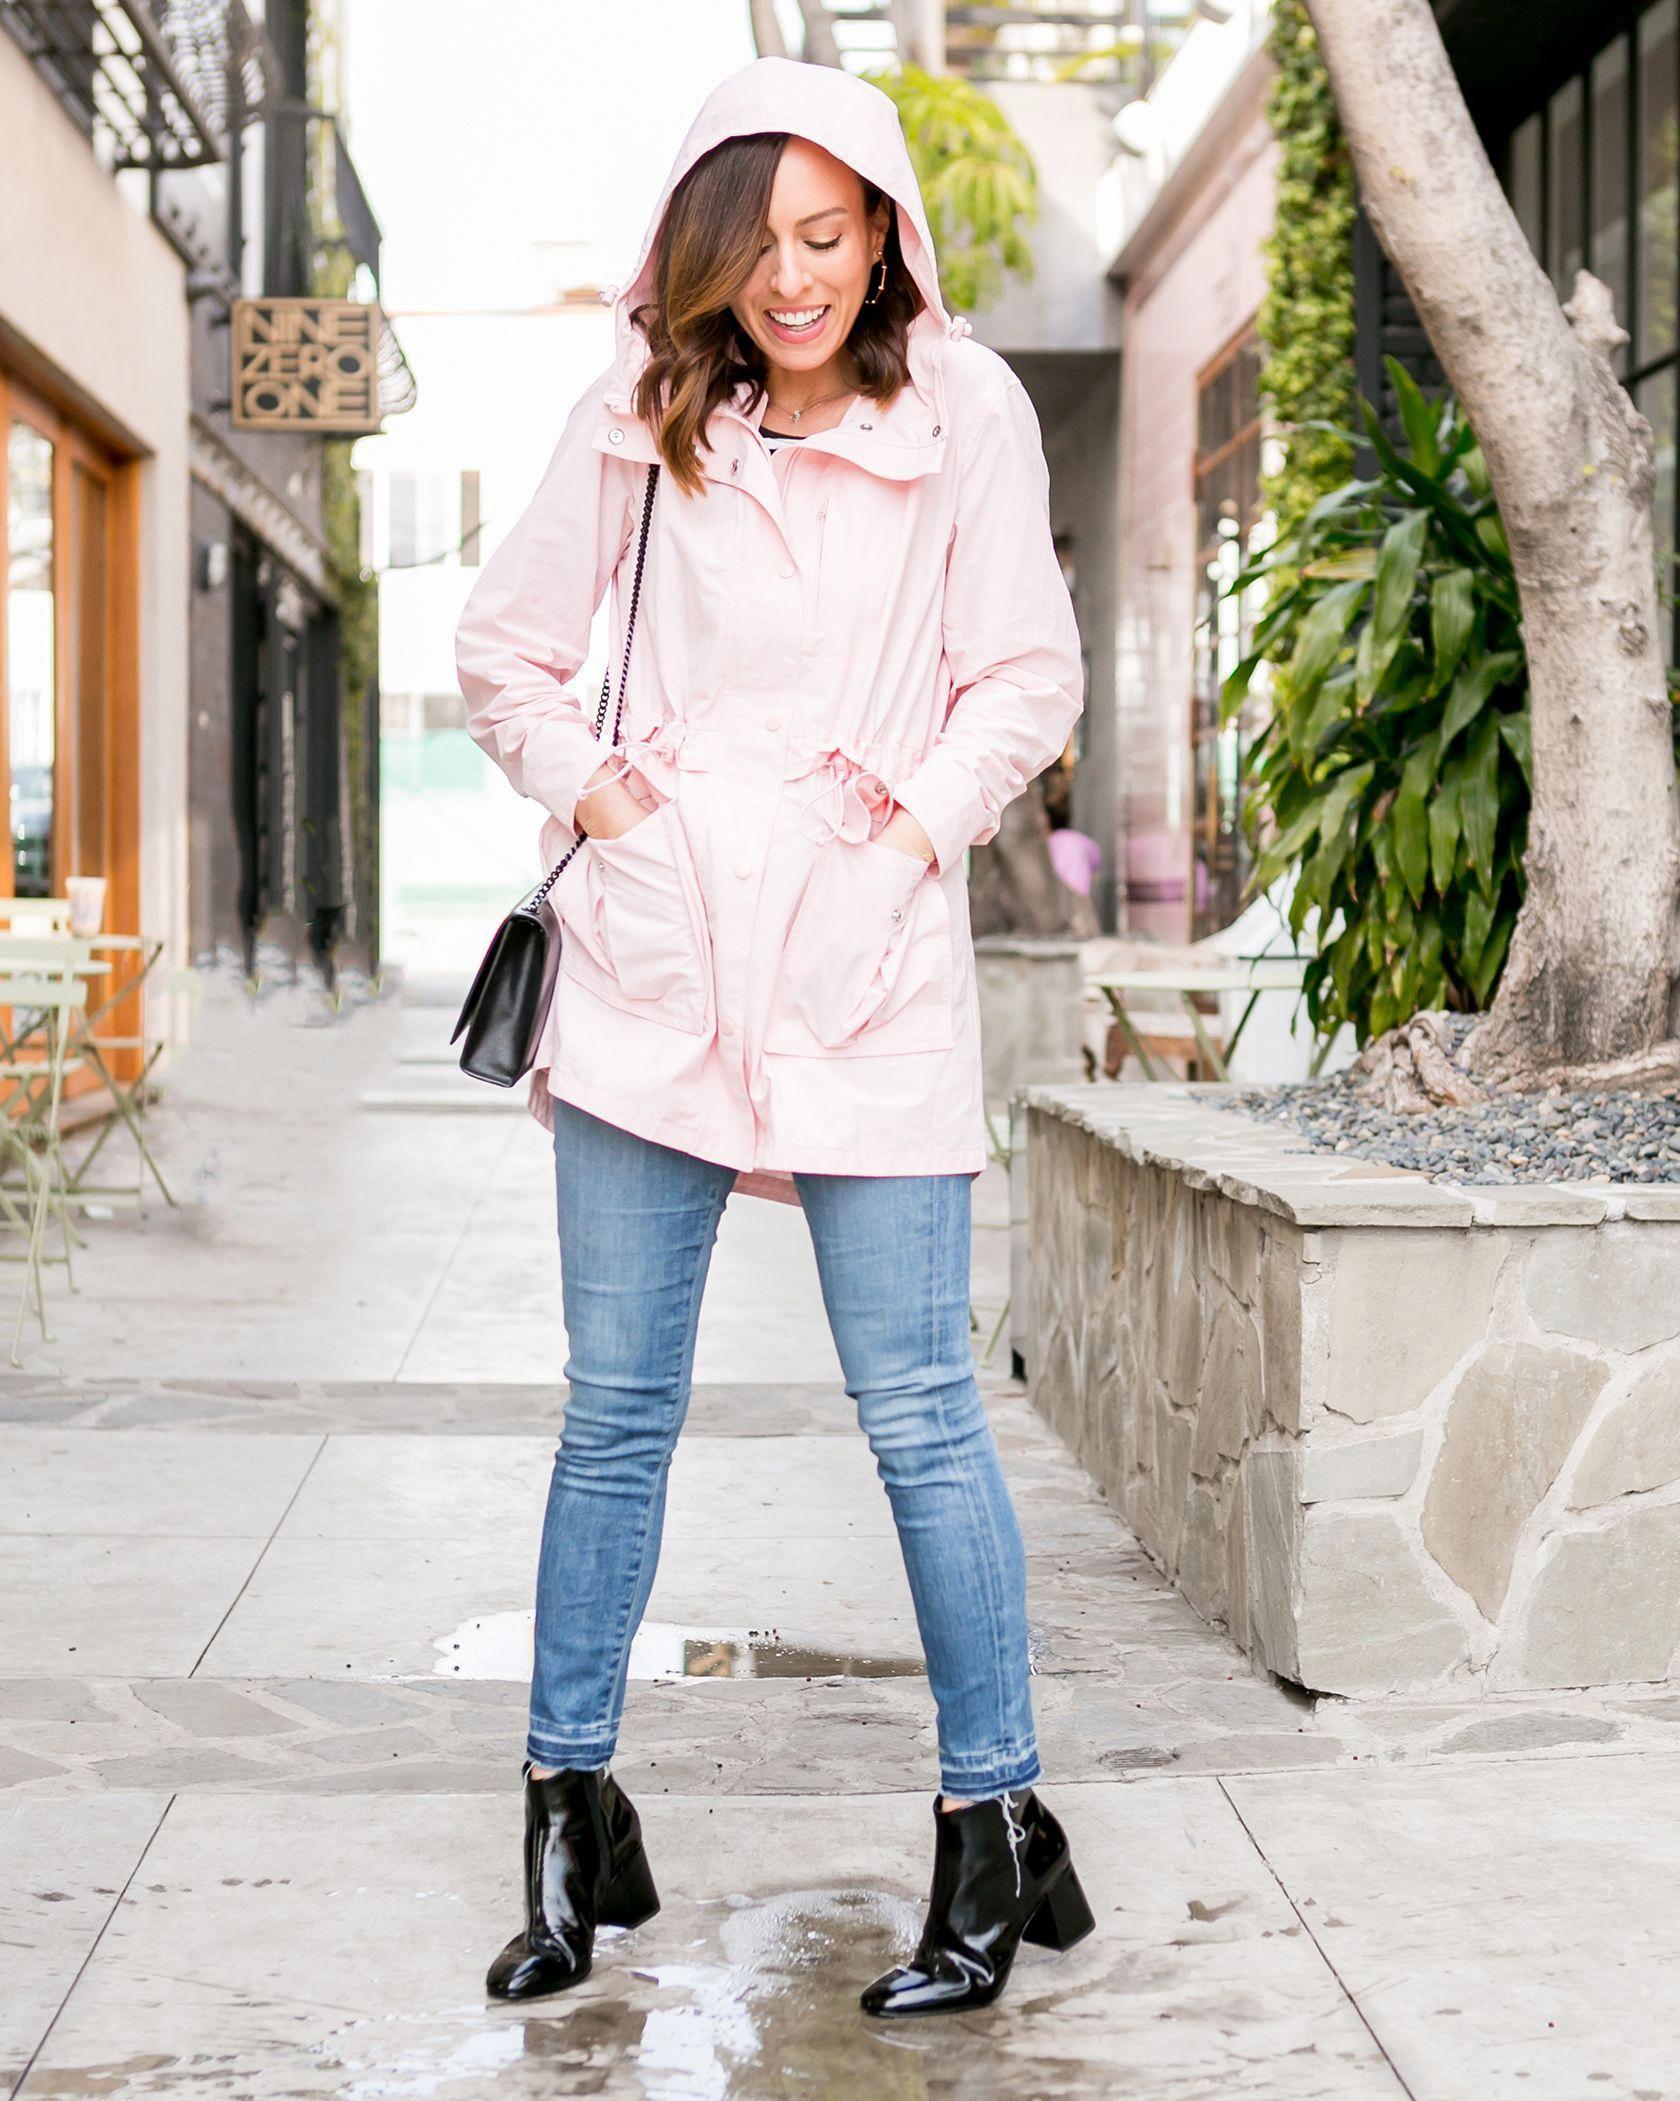 8c1d451277d4 Sydne Style shows what to wear in the rain in jcrew pink raincoat  pink   raincoats  rainjackets  jeans  RaincoatForCats